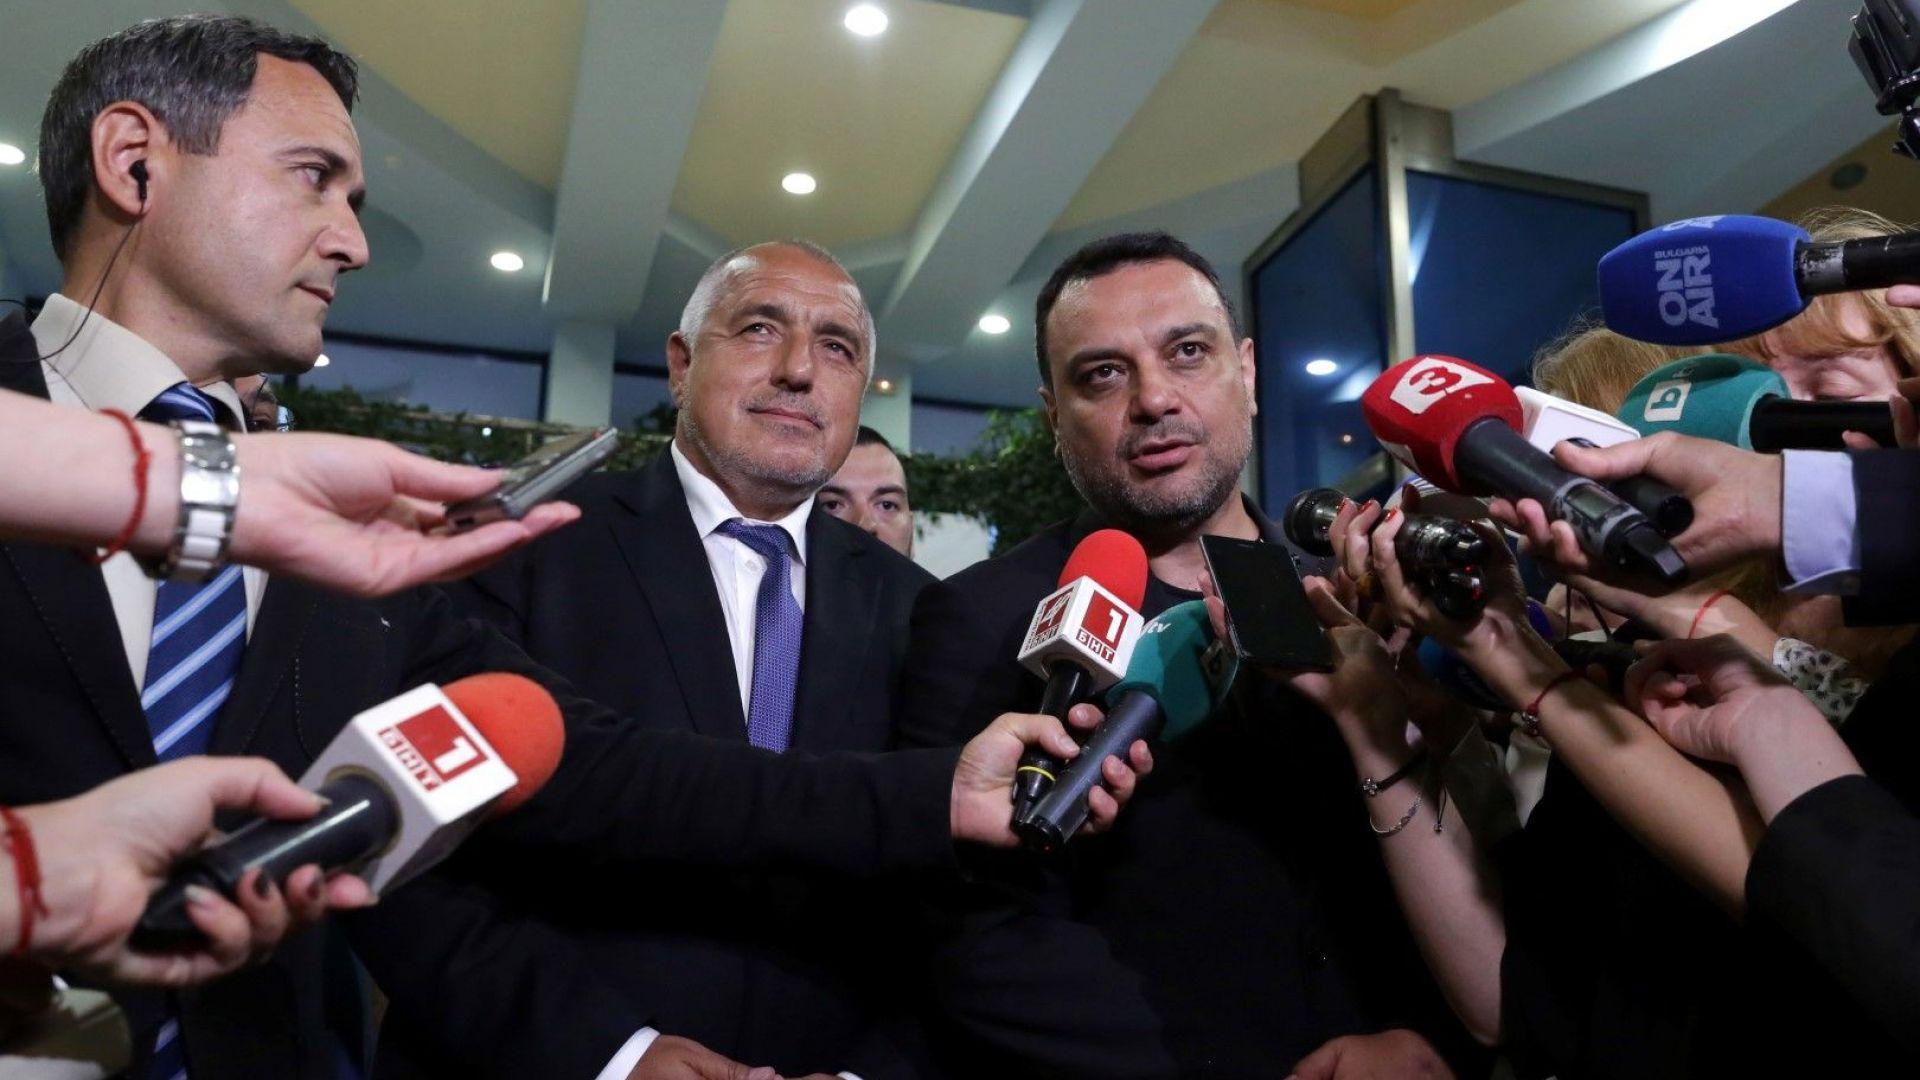 Борисов: Не съм съгласен, че сме победили Макрон